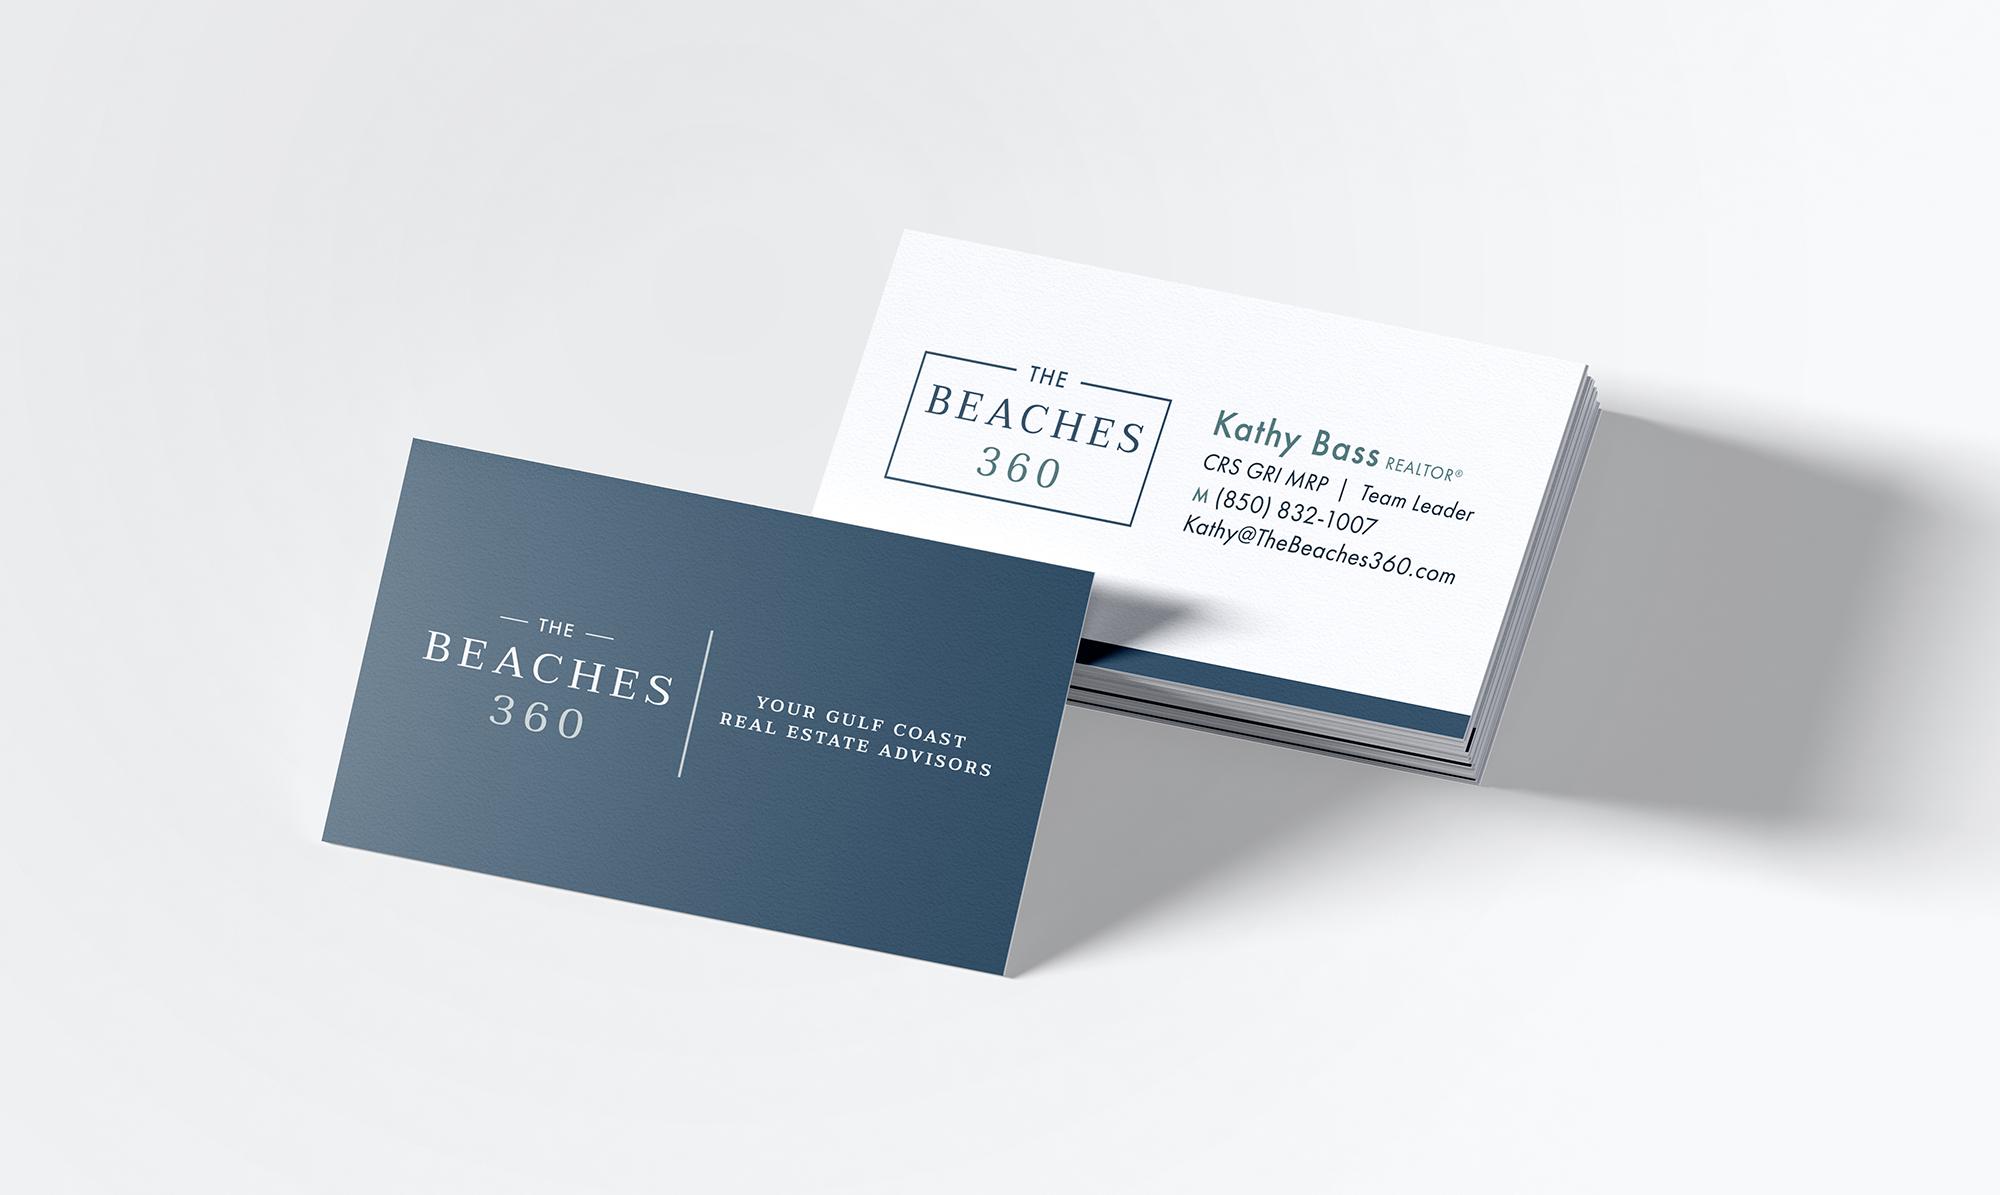 BusinessCards_Beaches360.jpg